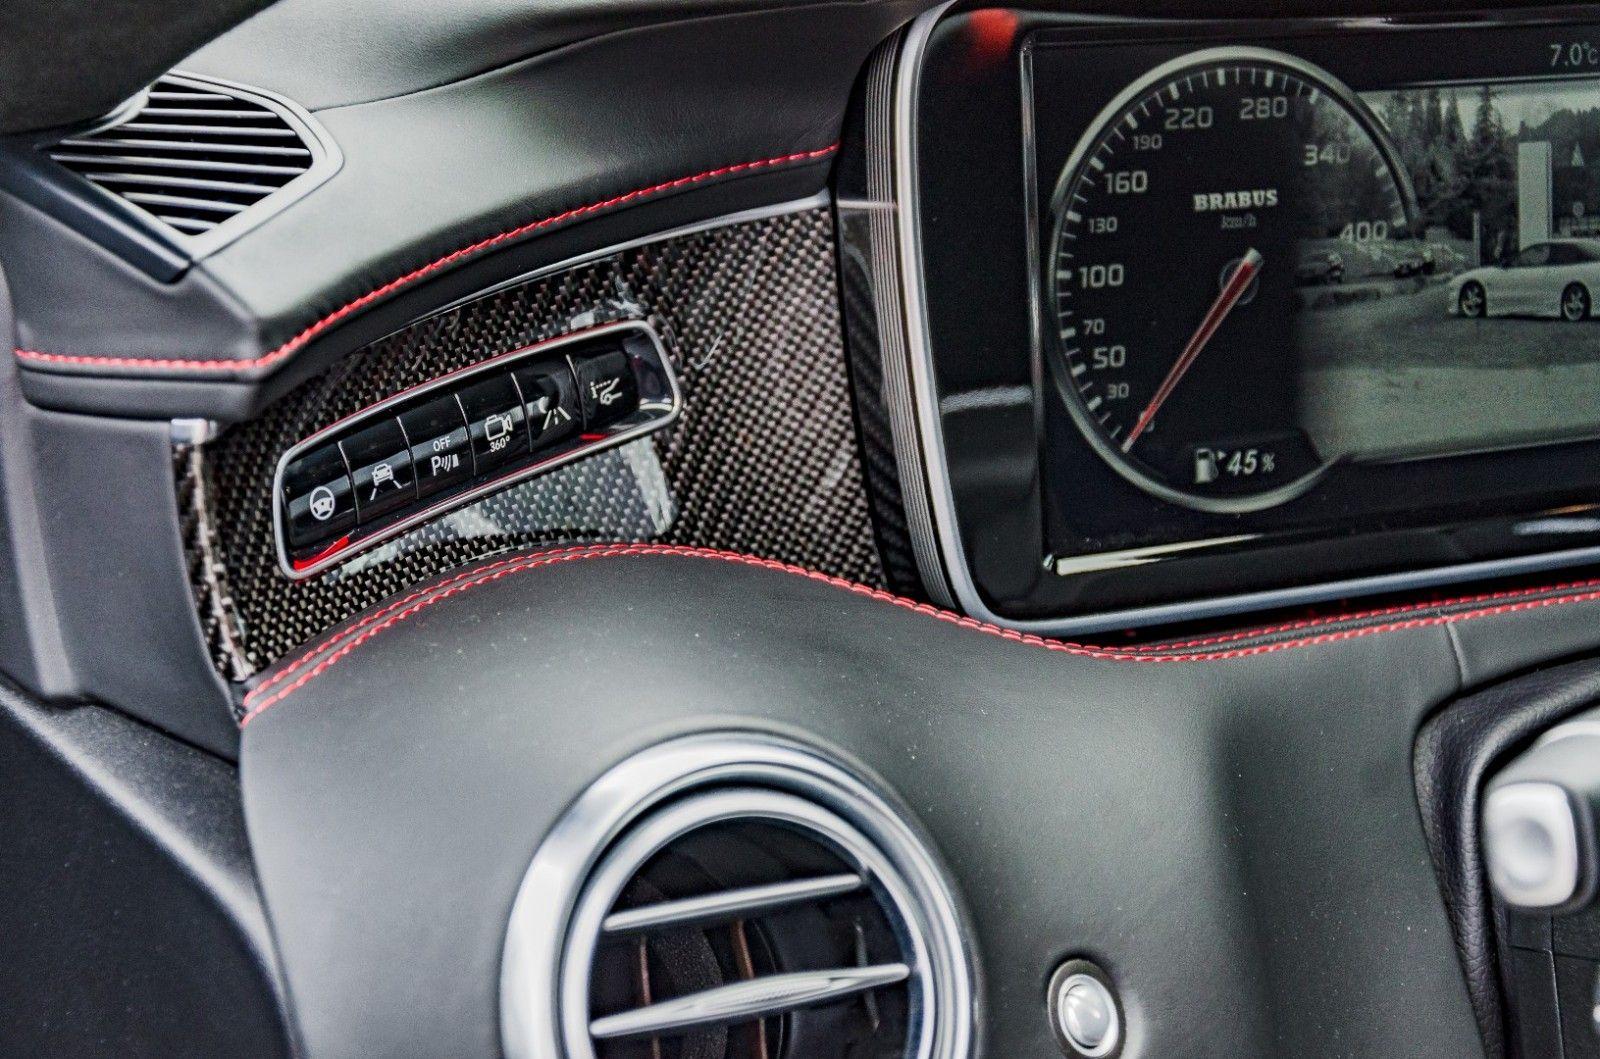 Mercedes Benz S 63 Amg Brabus 850 Exclusive Full Export Price